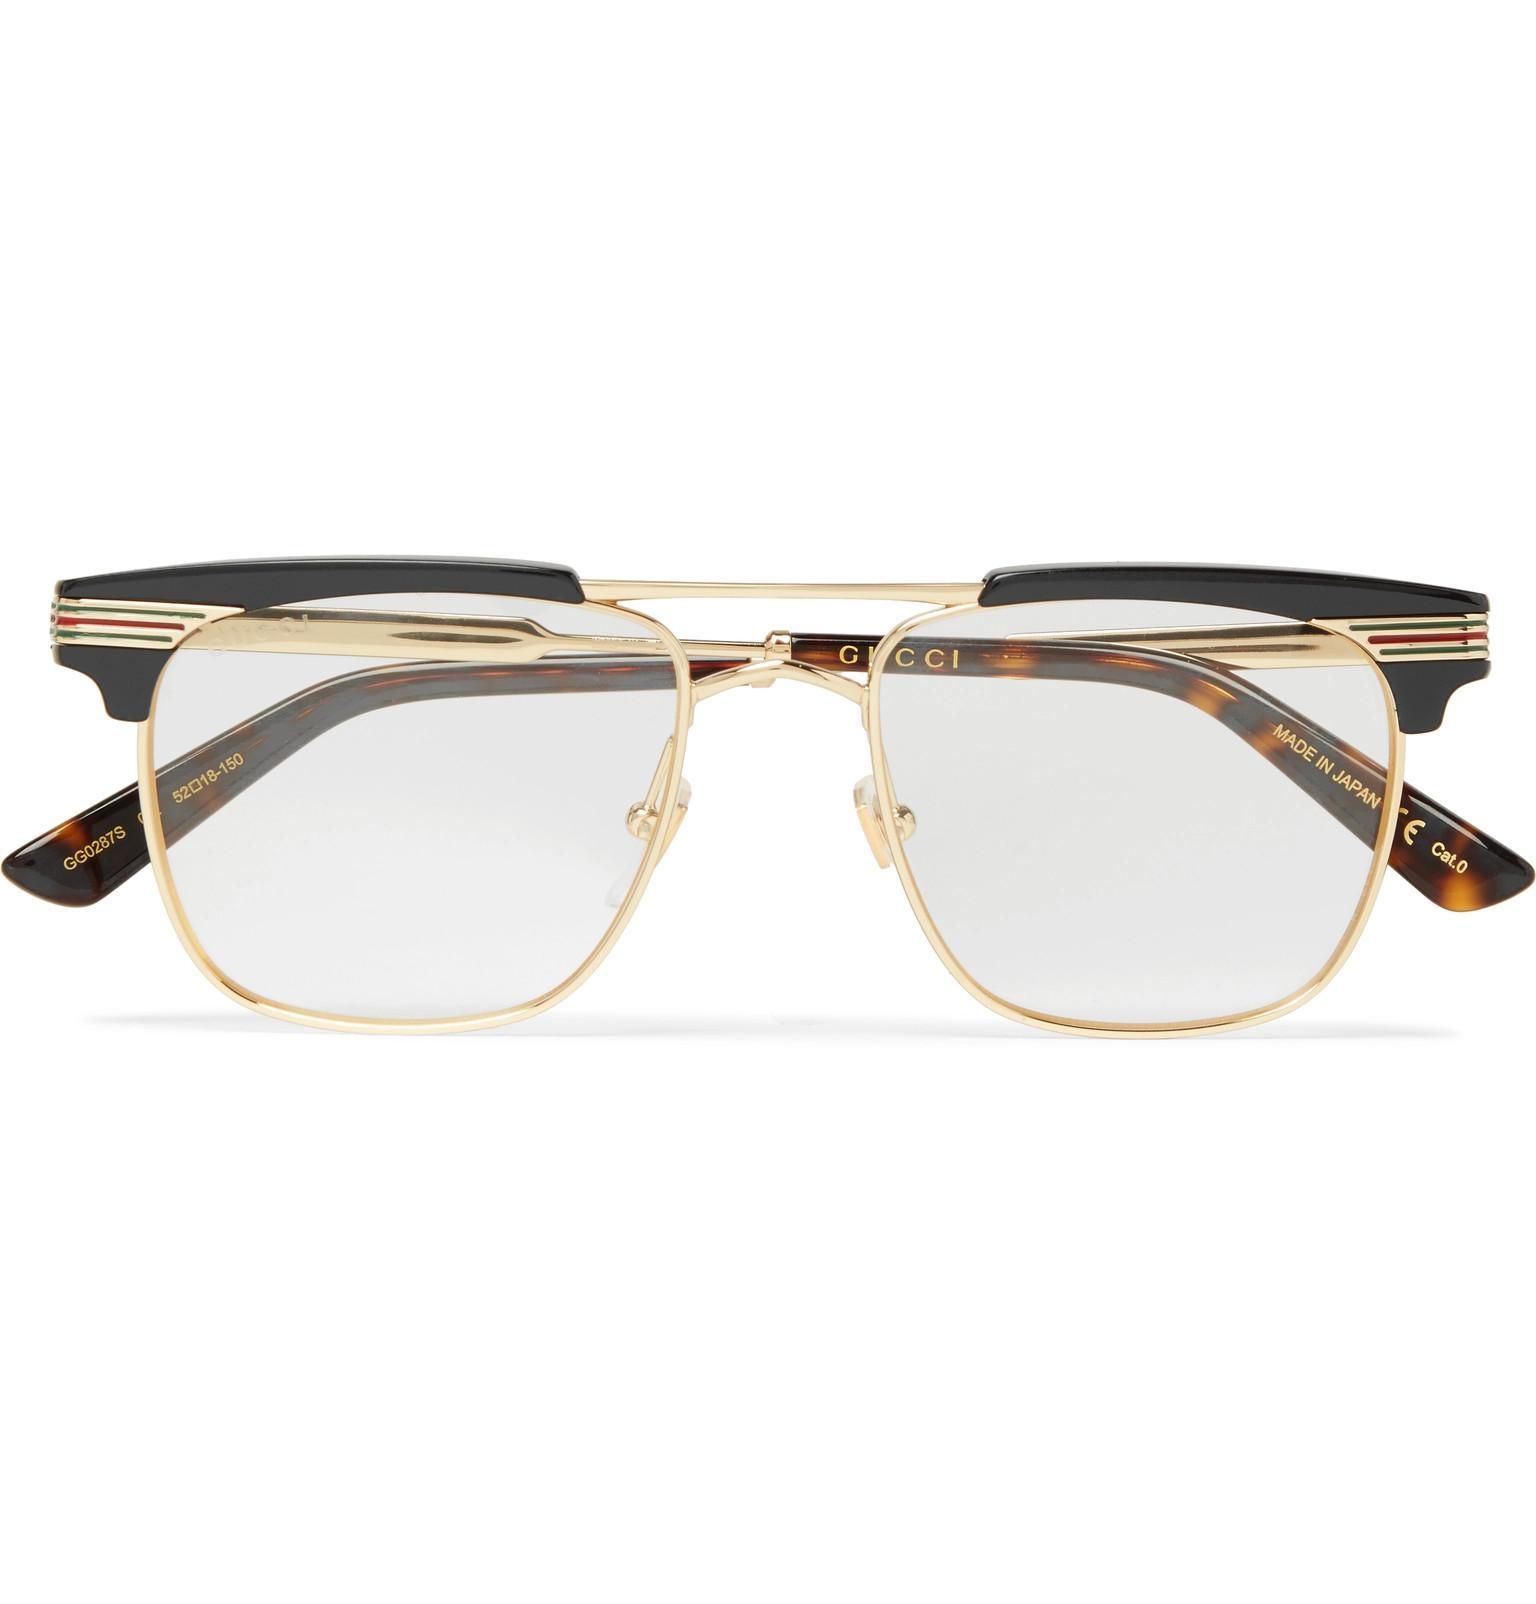 6c0c1f0777 Lyst - Gucci Endura Square-frame Gold-tone And Acetate Optical ...